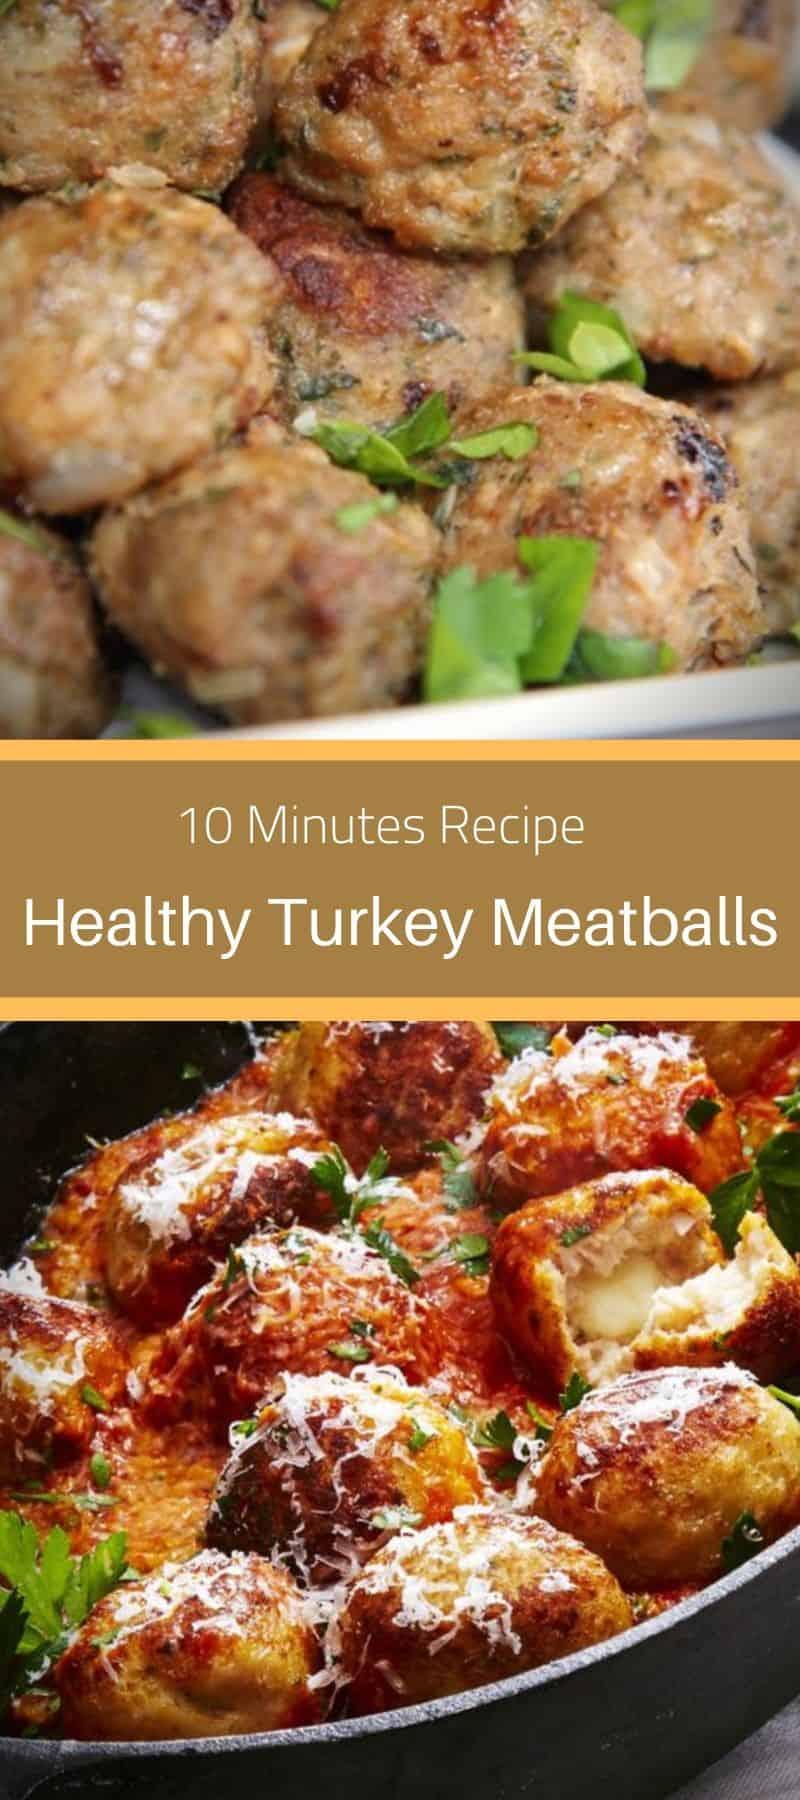 10-Minute Healthy Turkey Meatballs Recipe 3